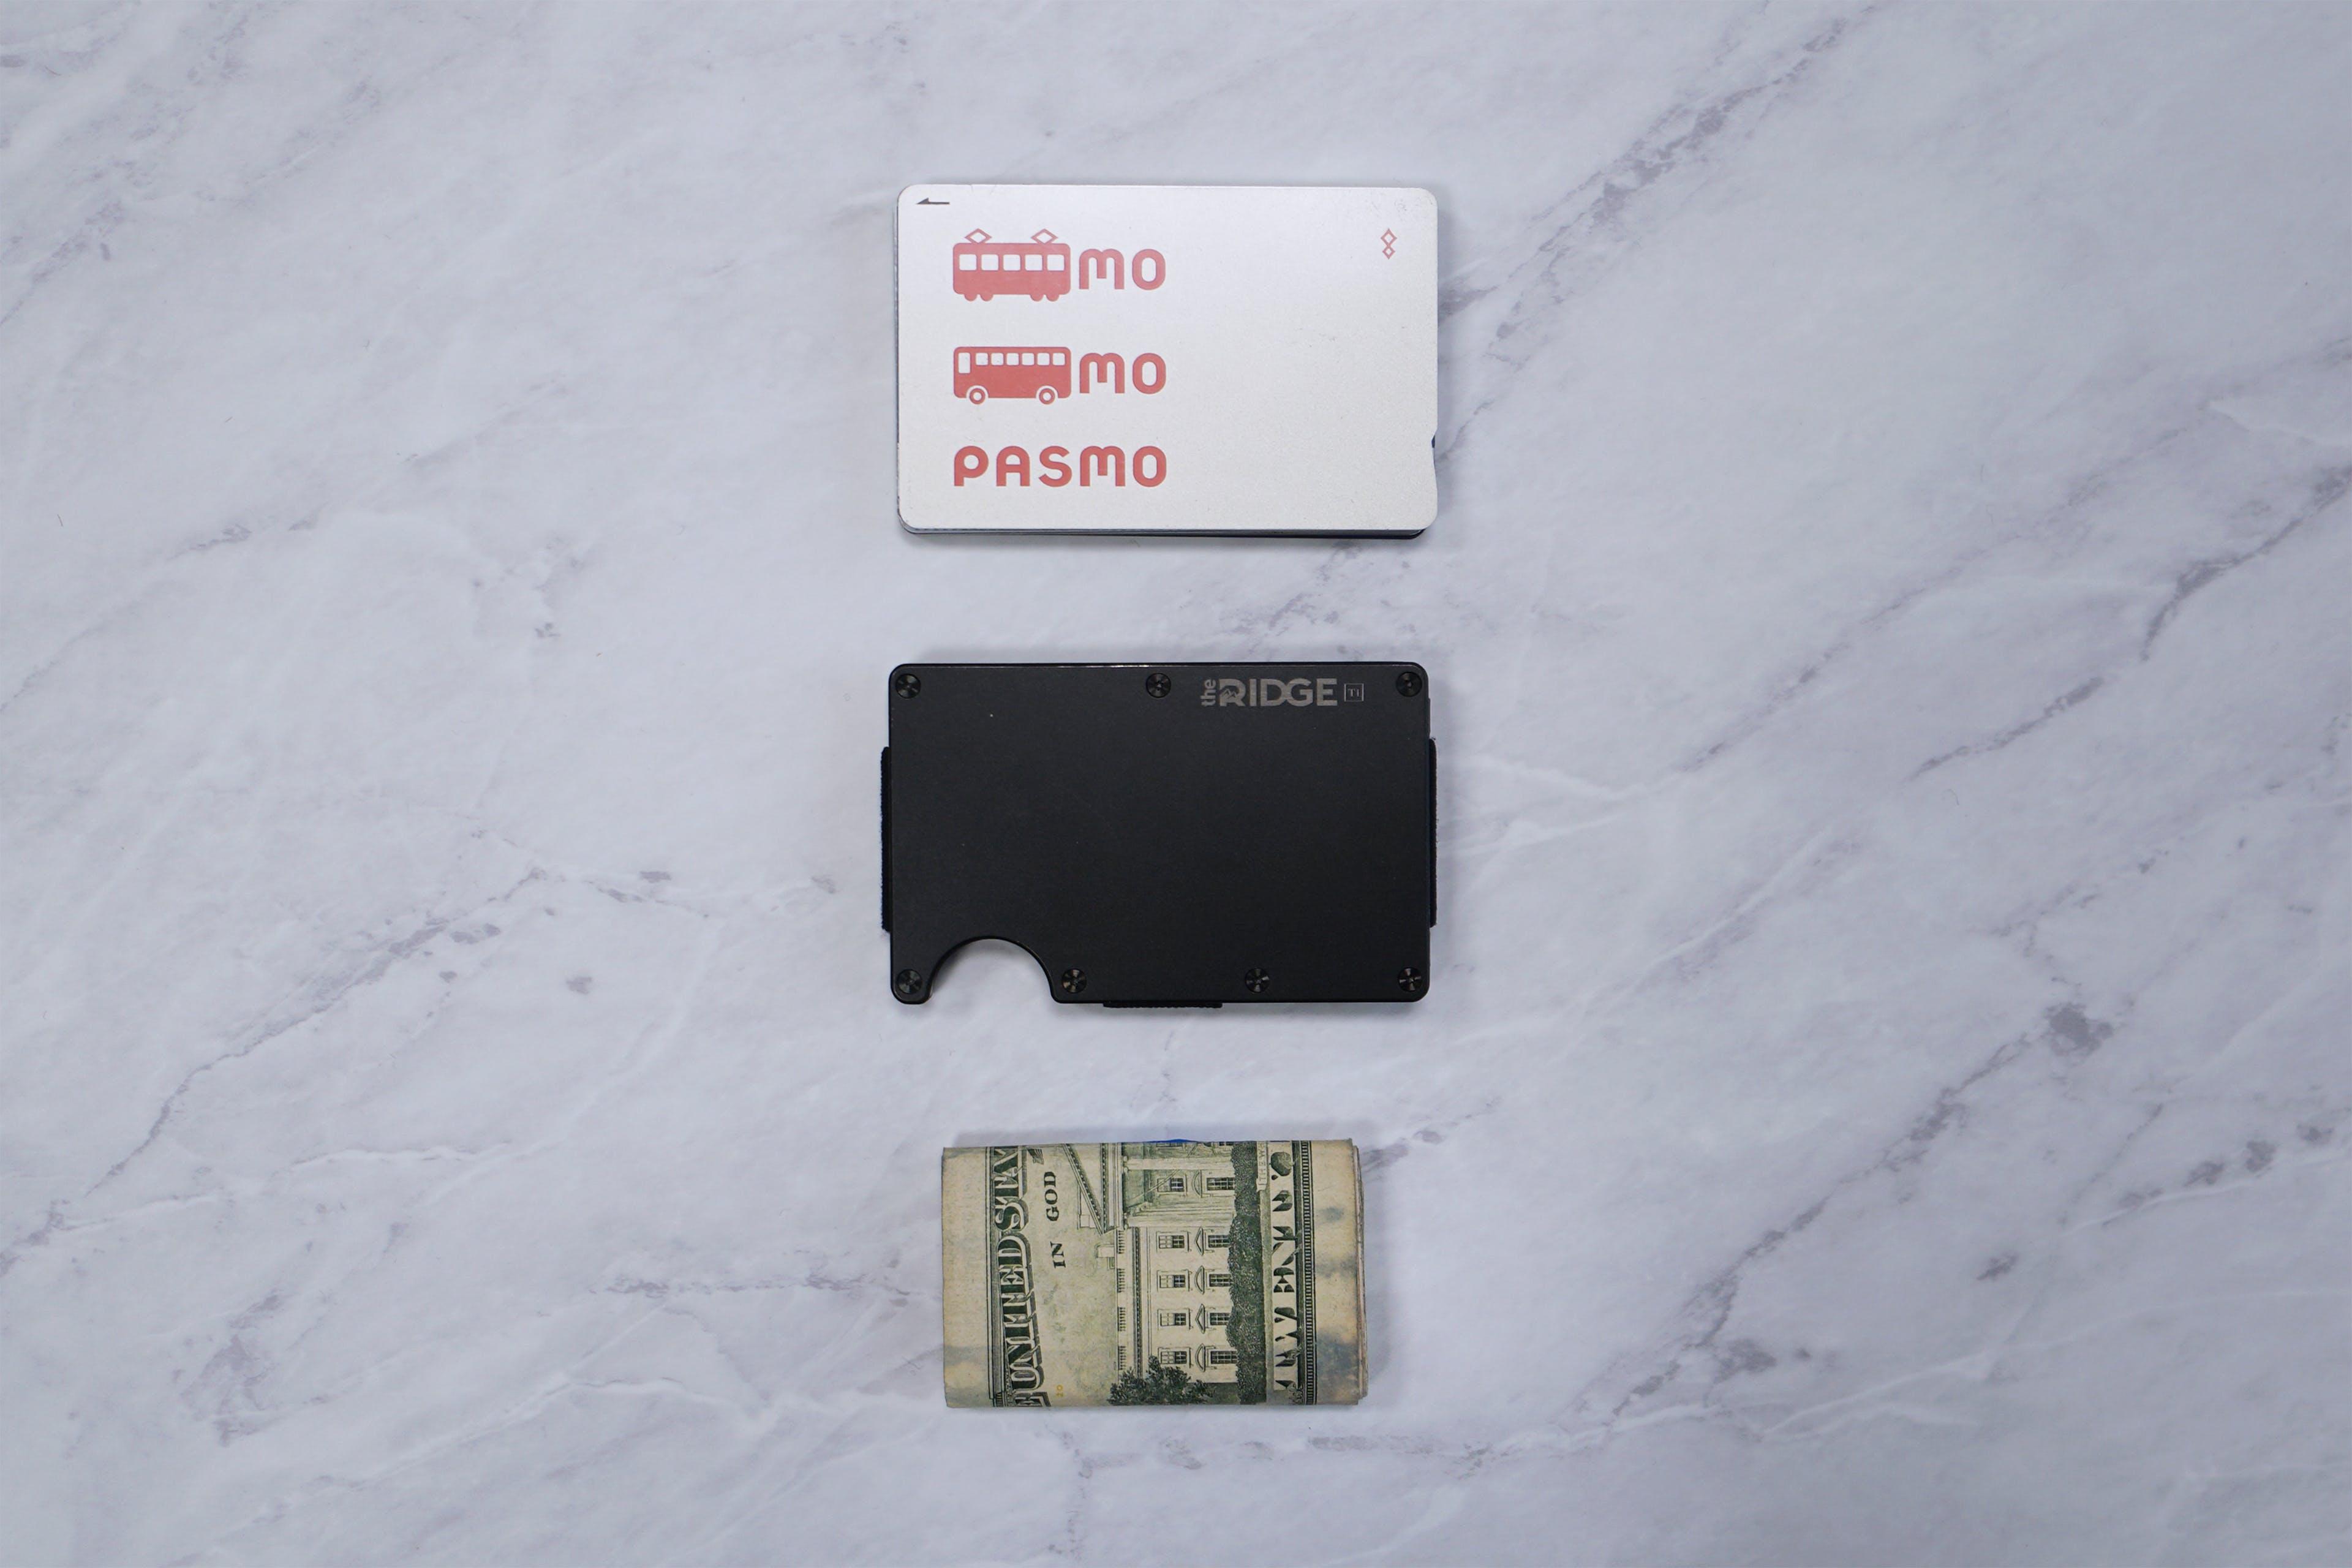 The Ridge Wallet Items Layout